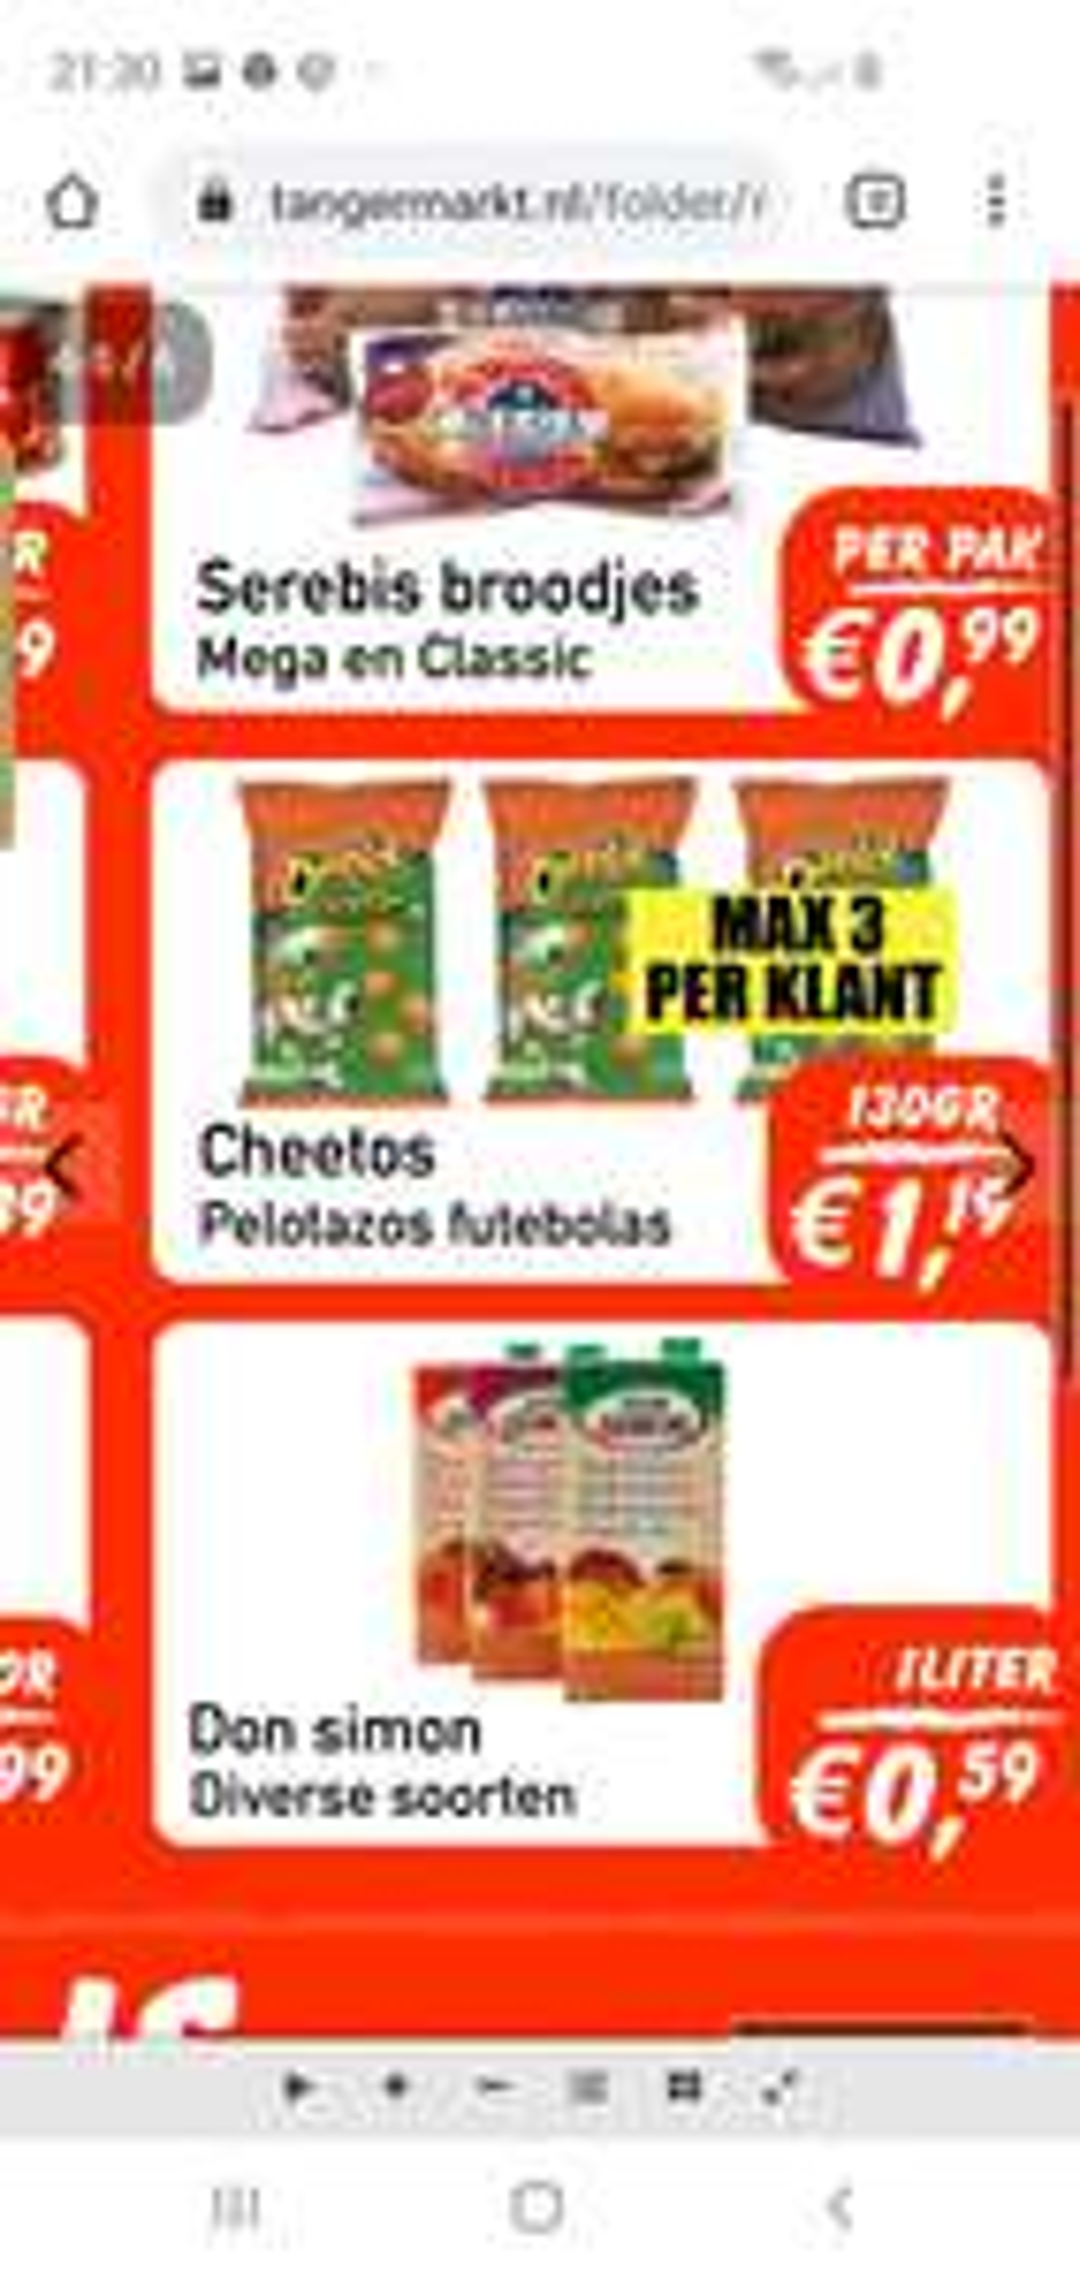 Lokaal tanger markt Cheetos pelatoz